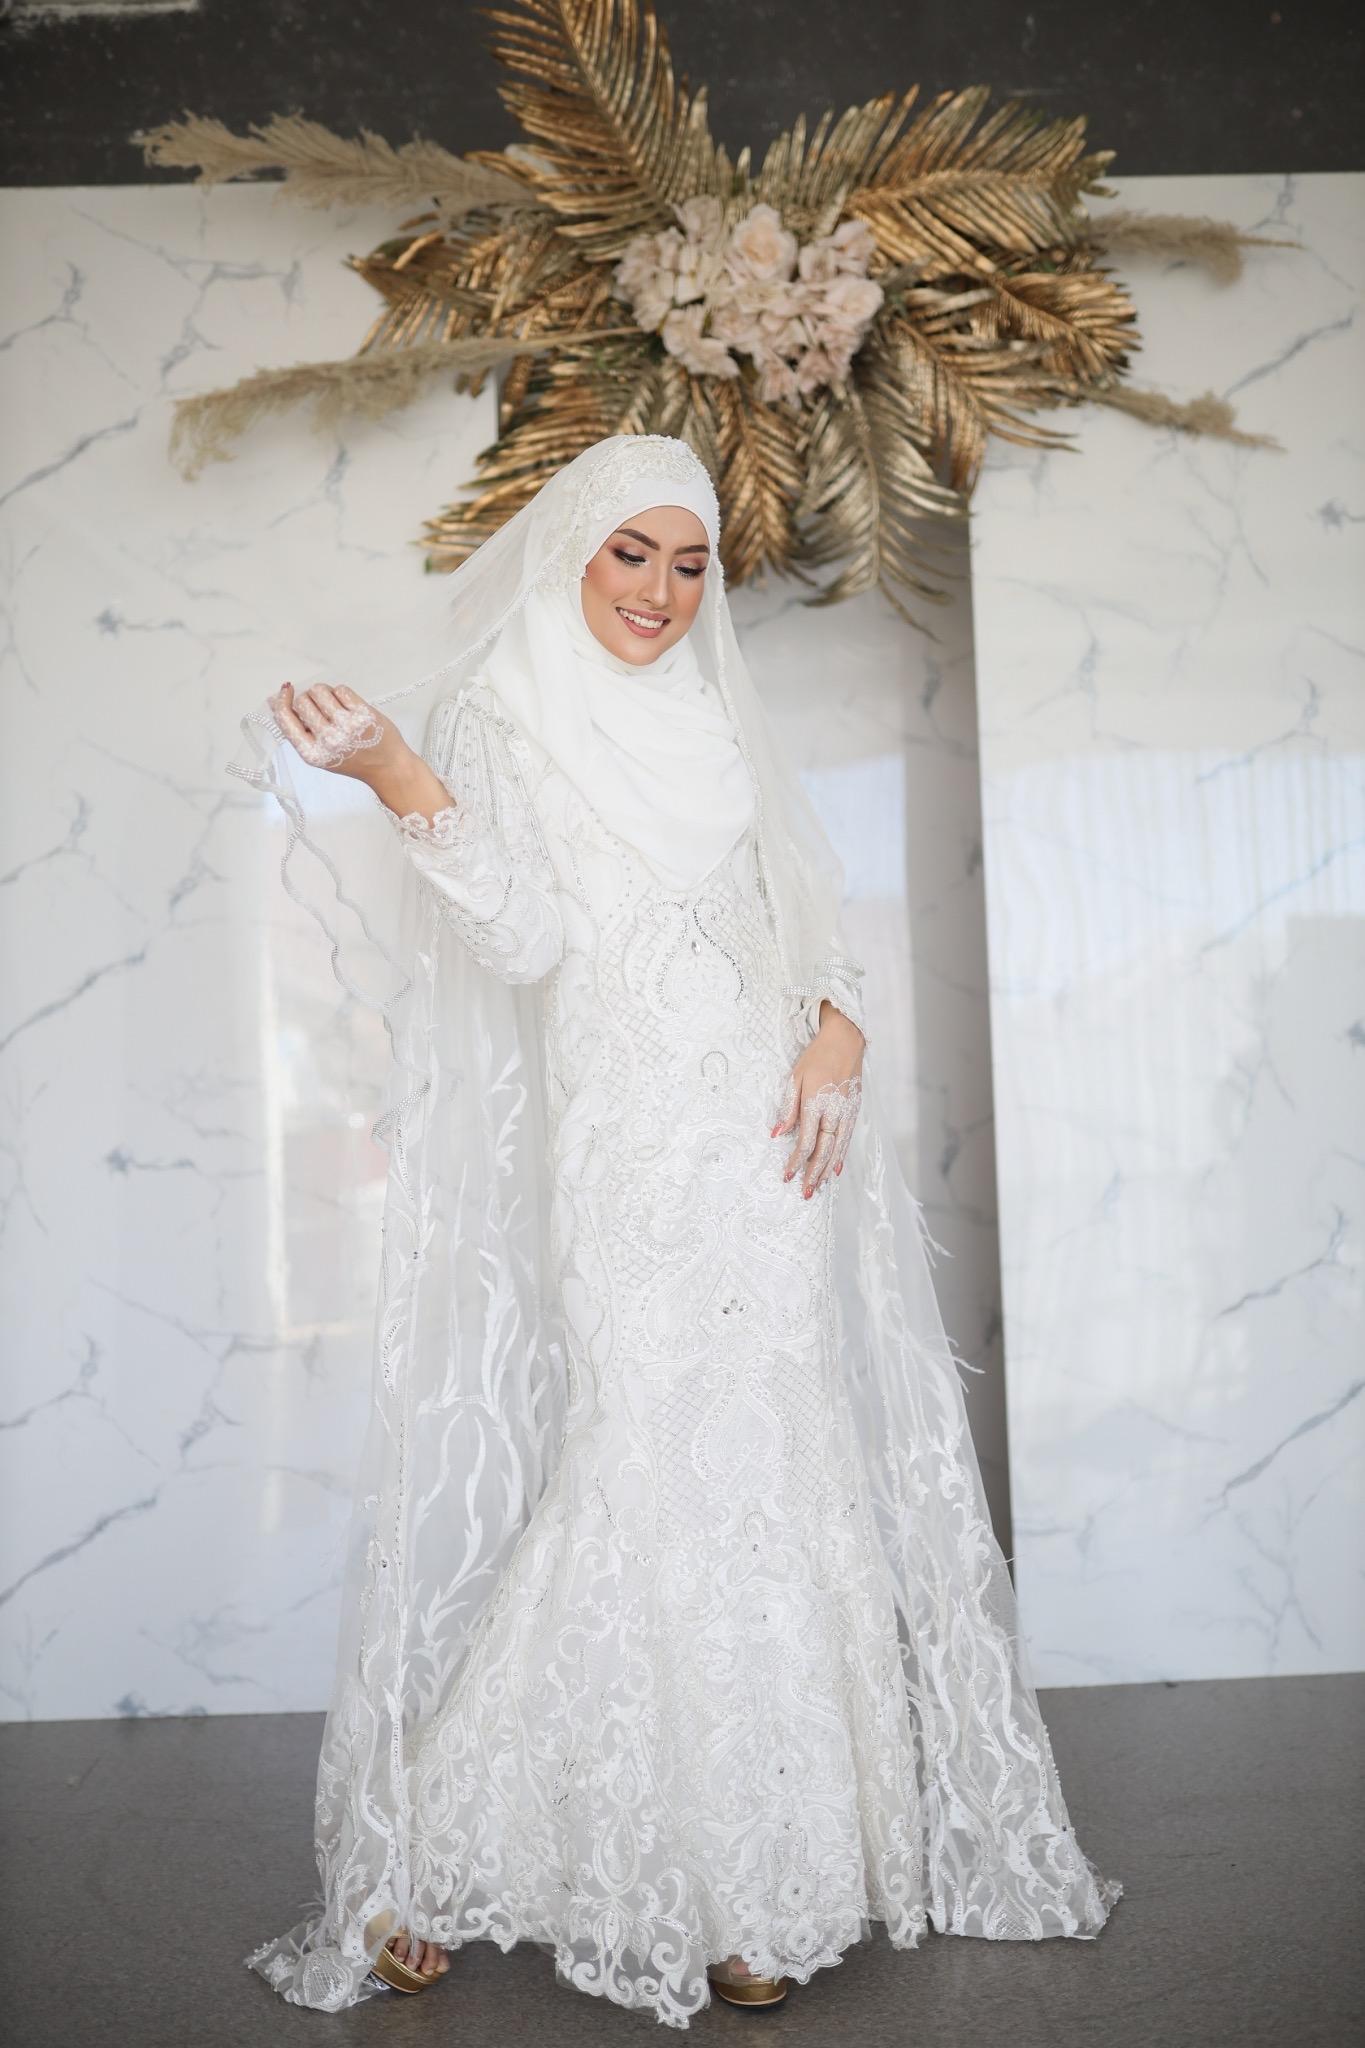 Model Gaun Pengantin Muslimah Sederhana